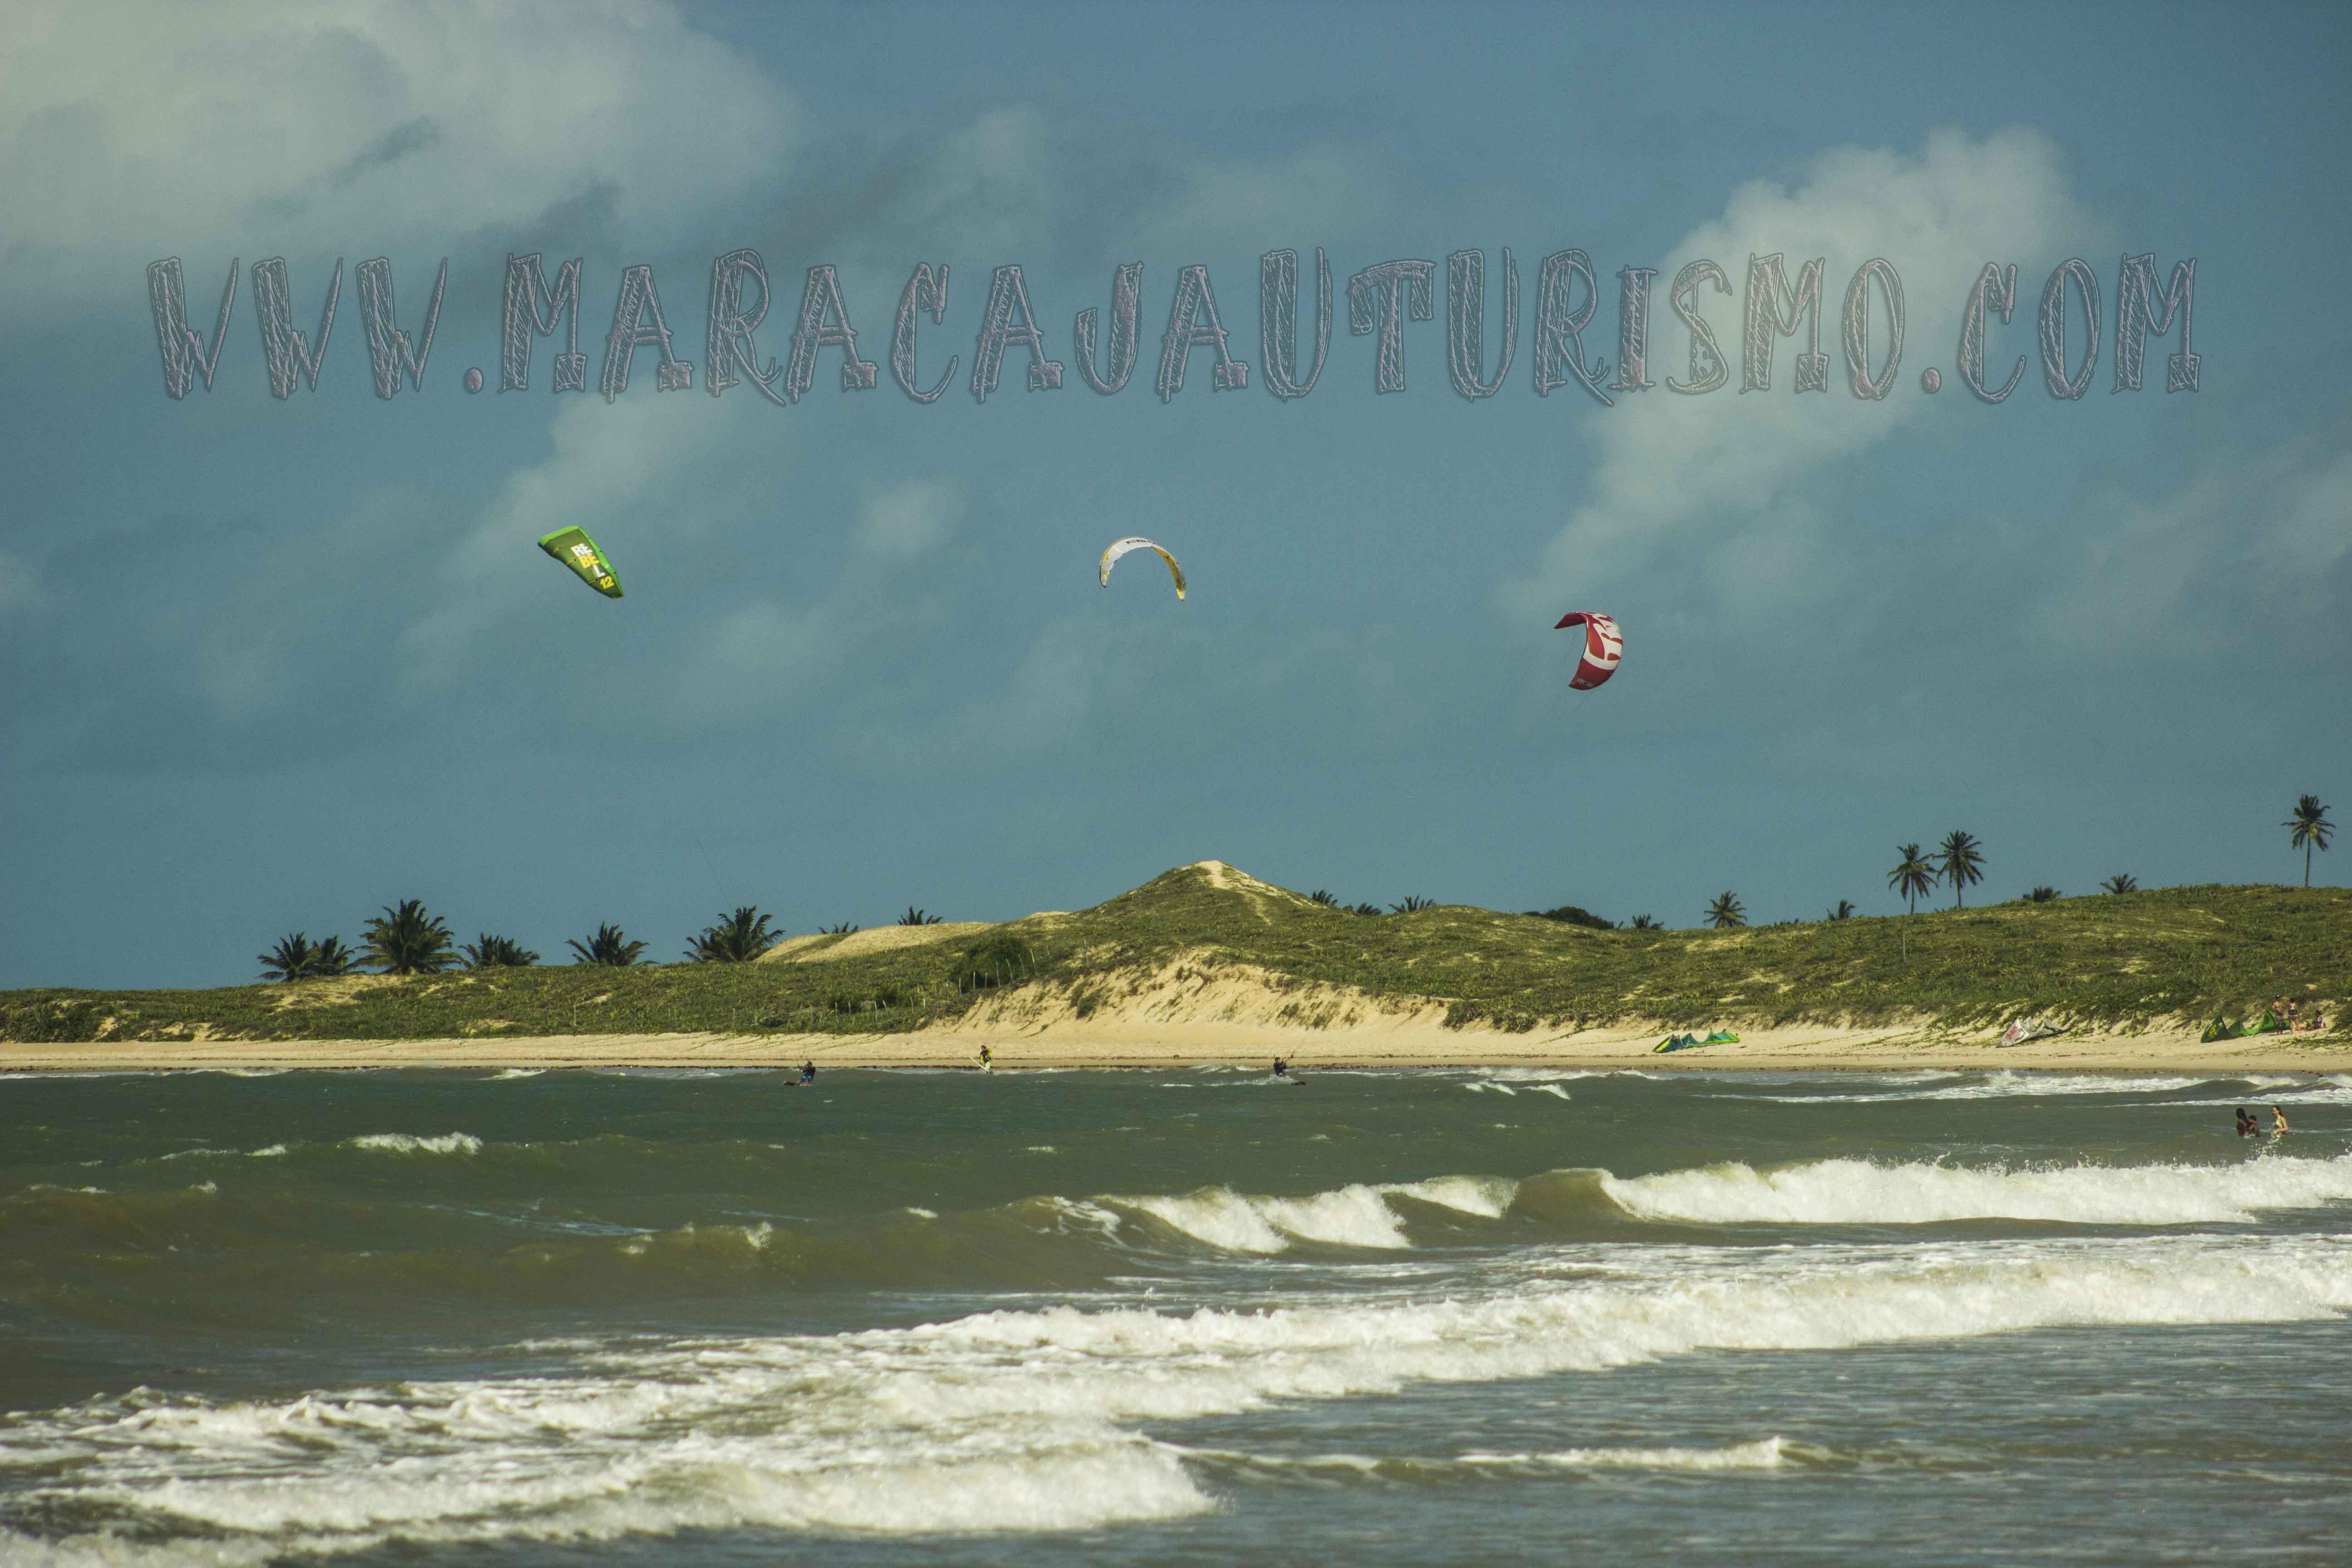 As praias de Maracajaú Kitesurf